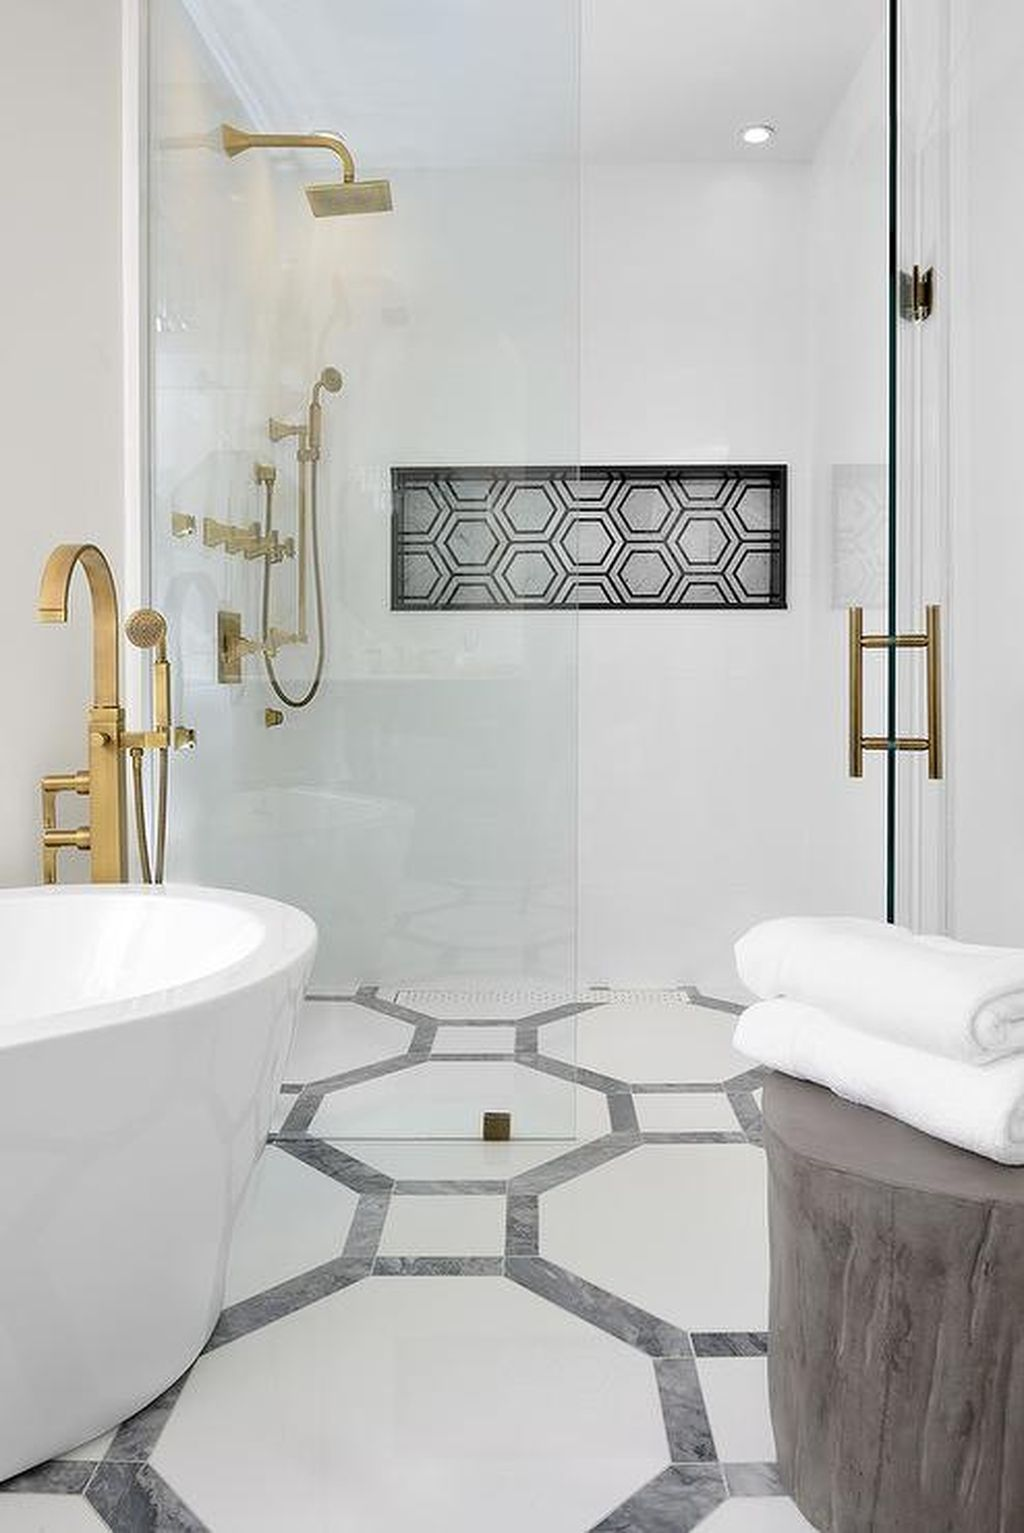 88 Stunning Black and White Bathroom Remodel Ideas | Black white ...